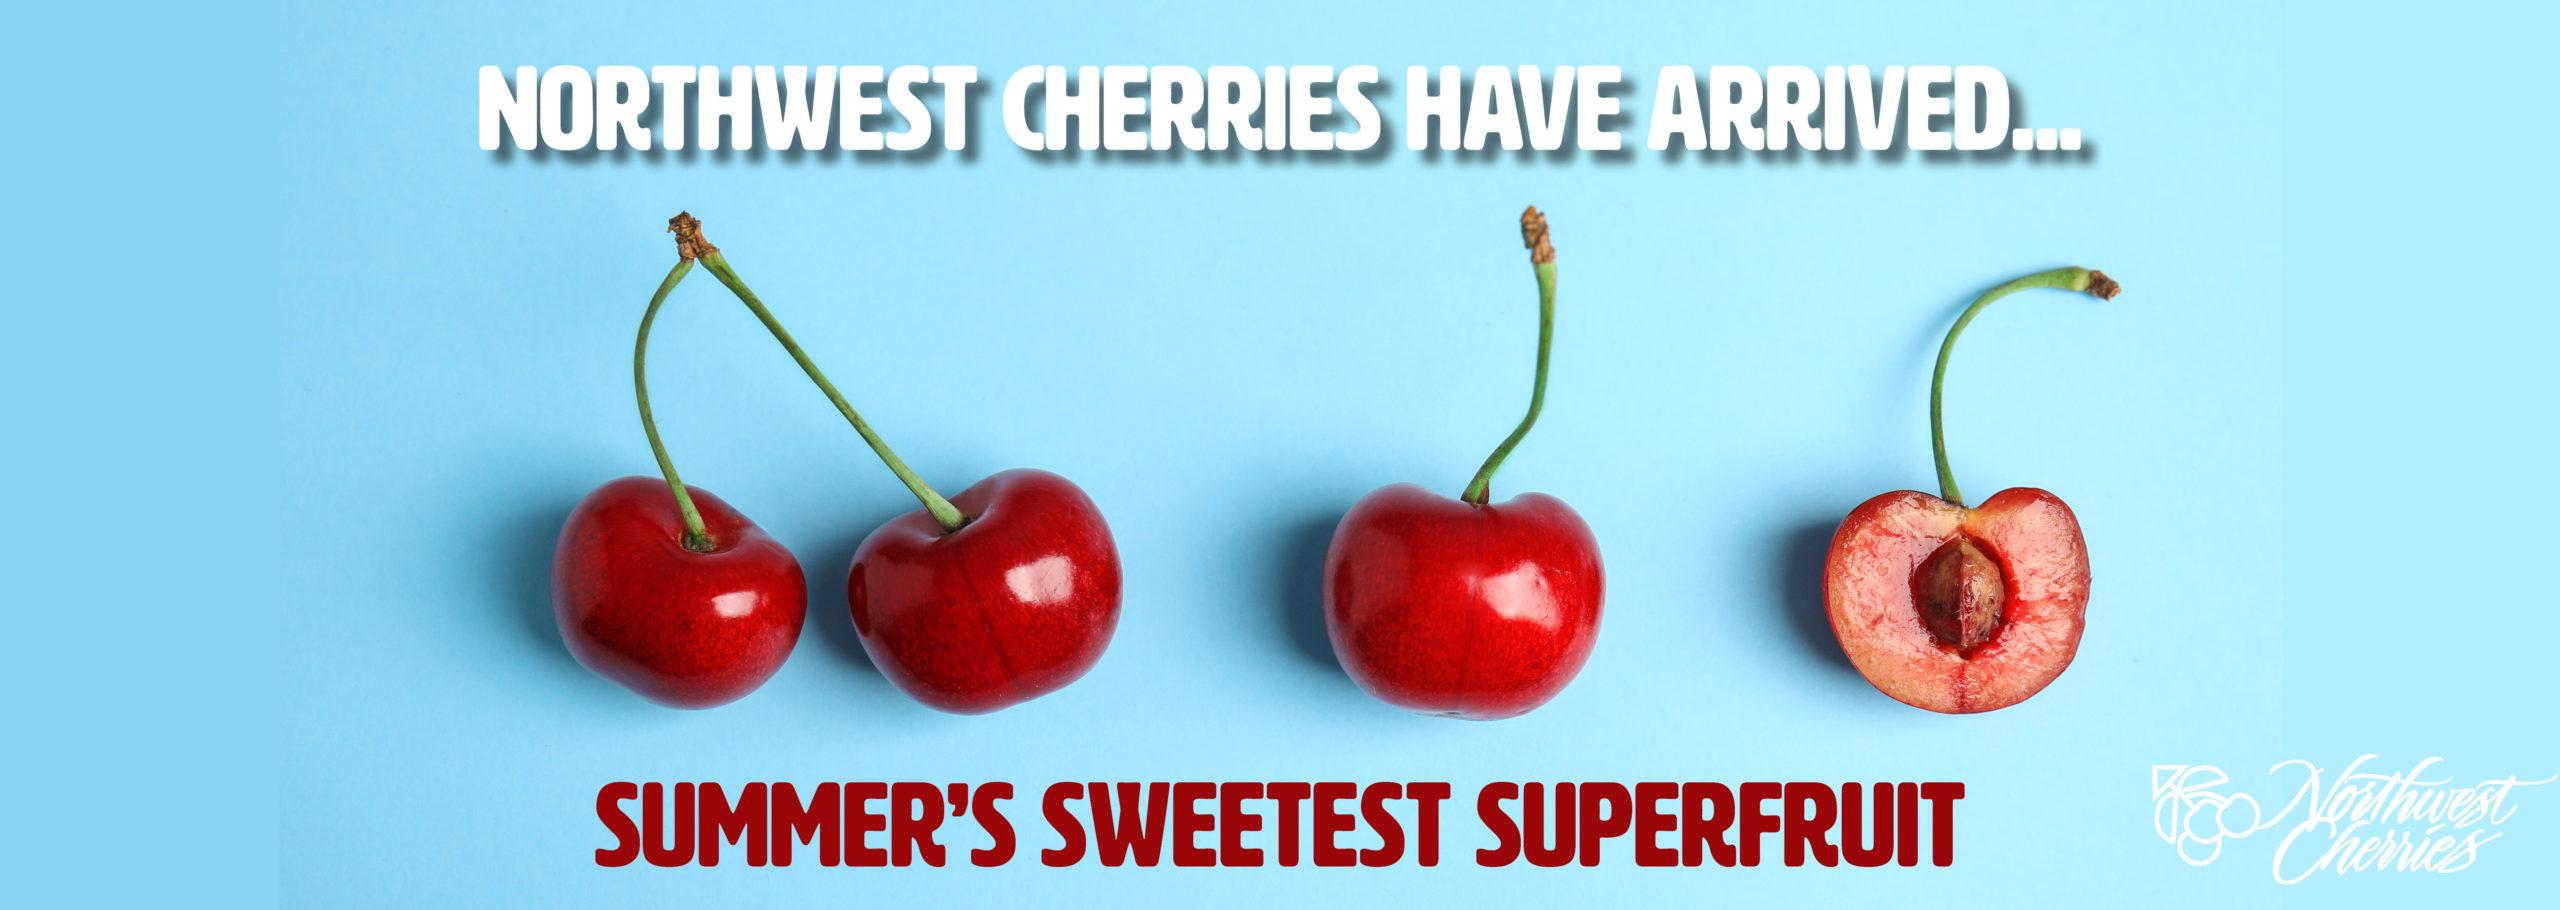 Northwest Cherries have arrived!